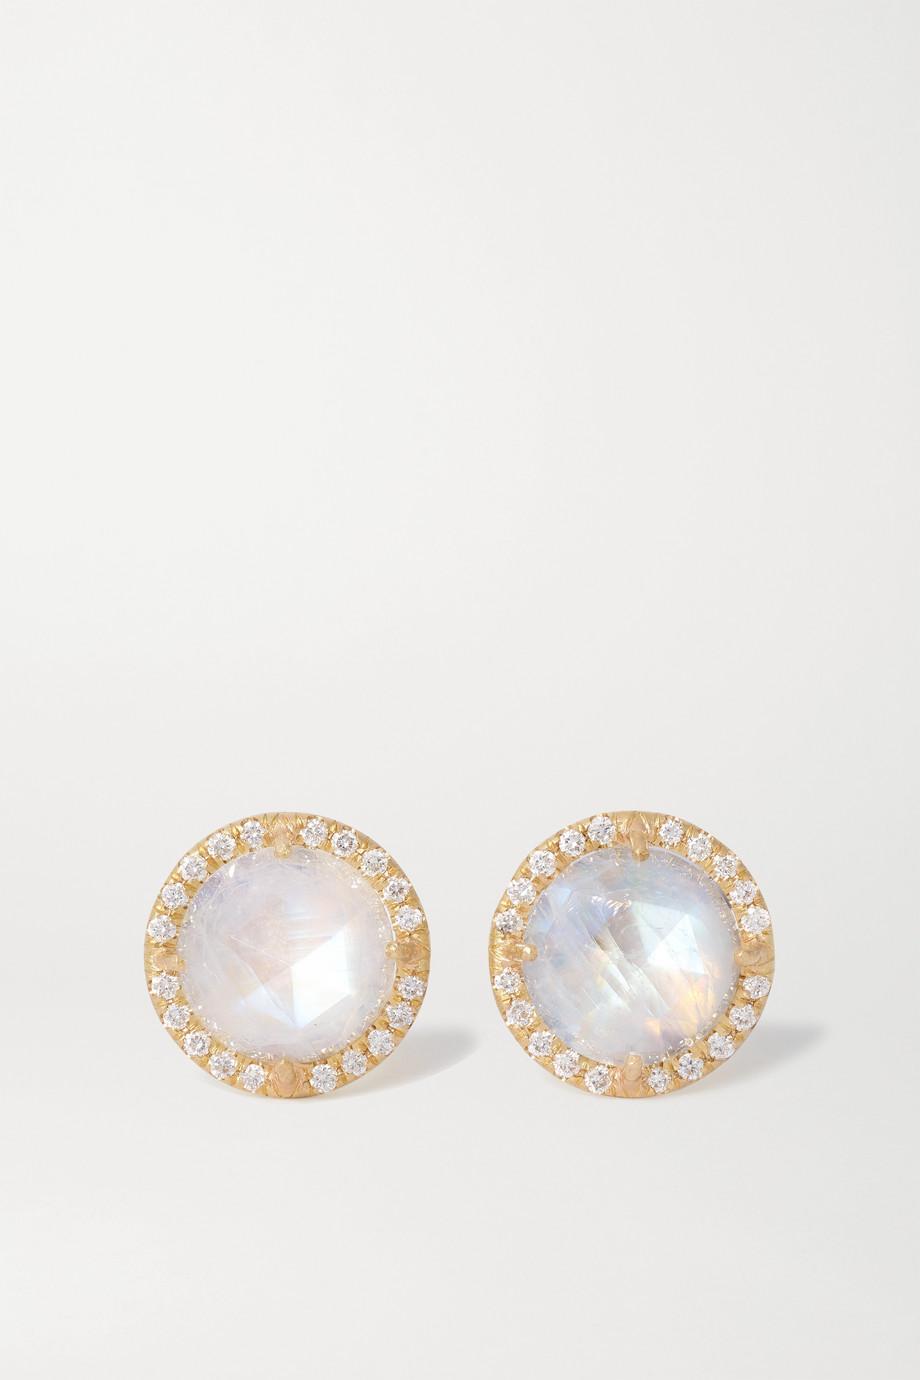 Irene Neuwirth 18-karat gold, moonstone and diamond earrings